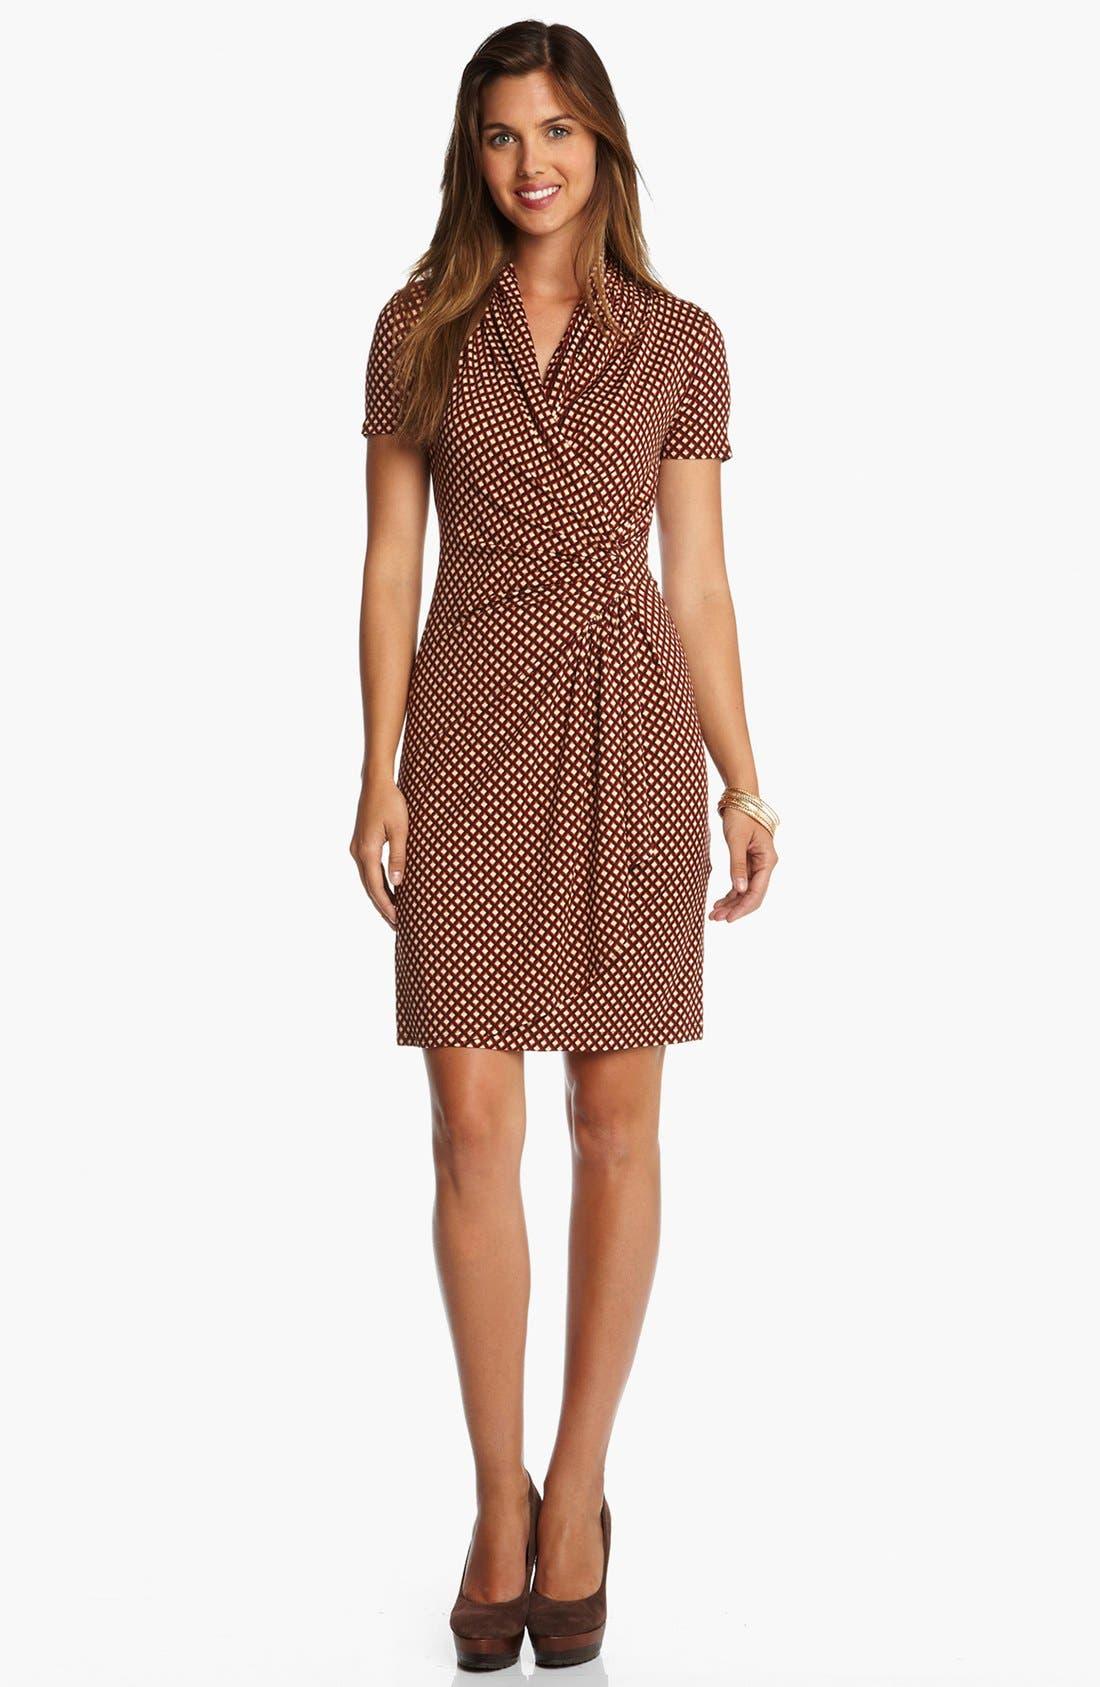 Alternate Image 1 Selected - Karen Kane 'Spice Market' Faux Wrap Dress